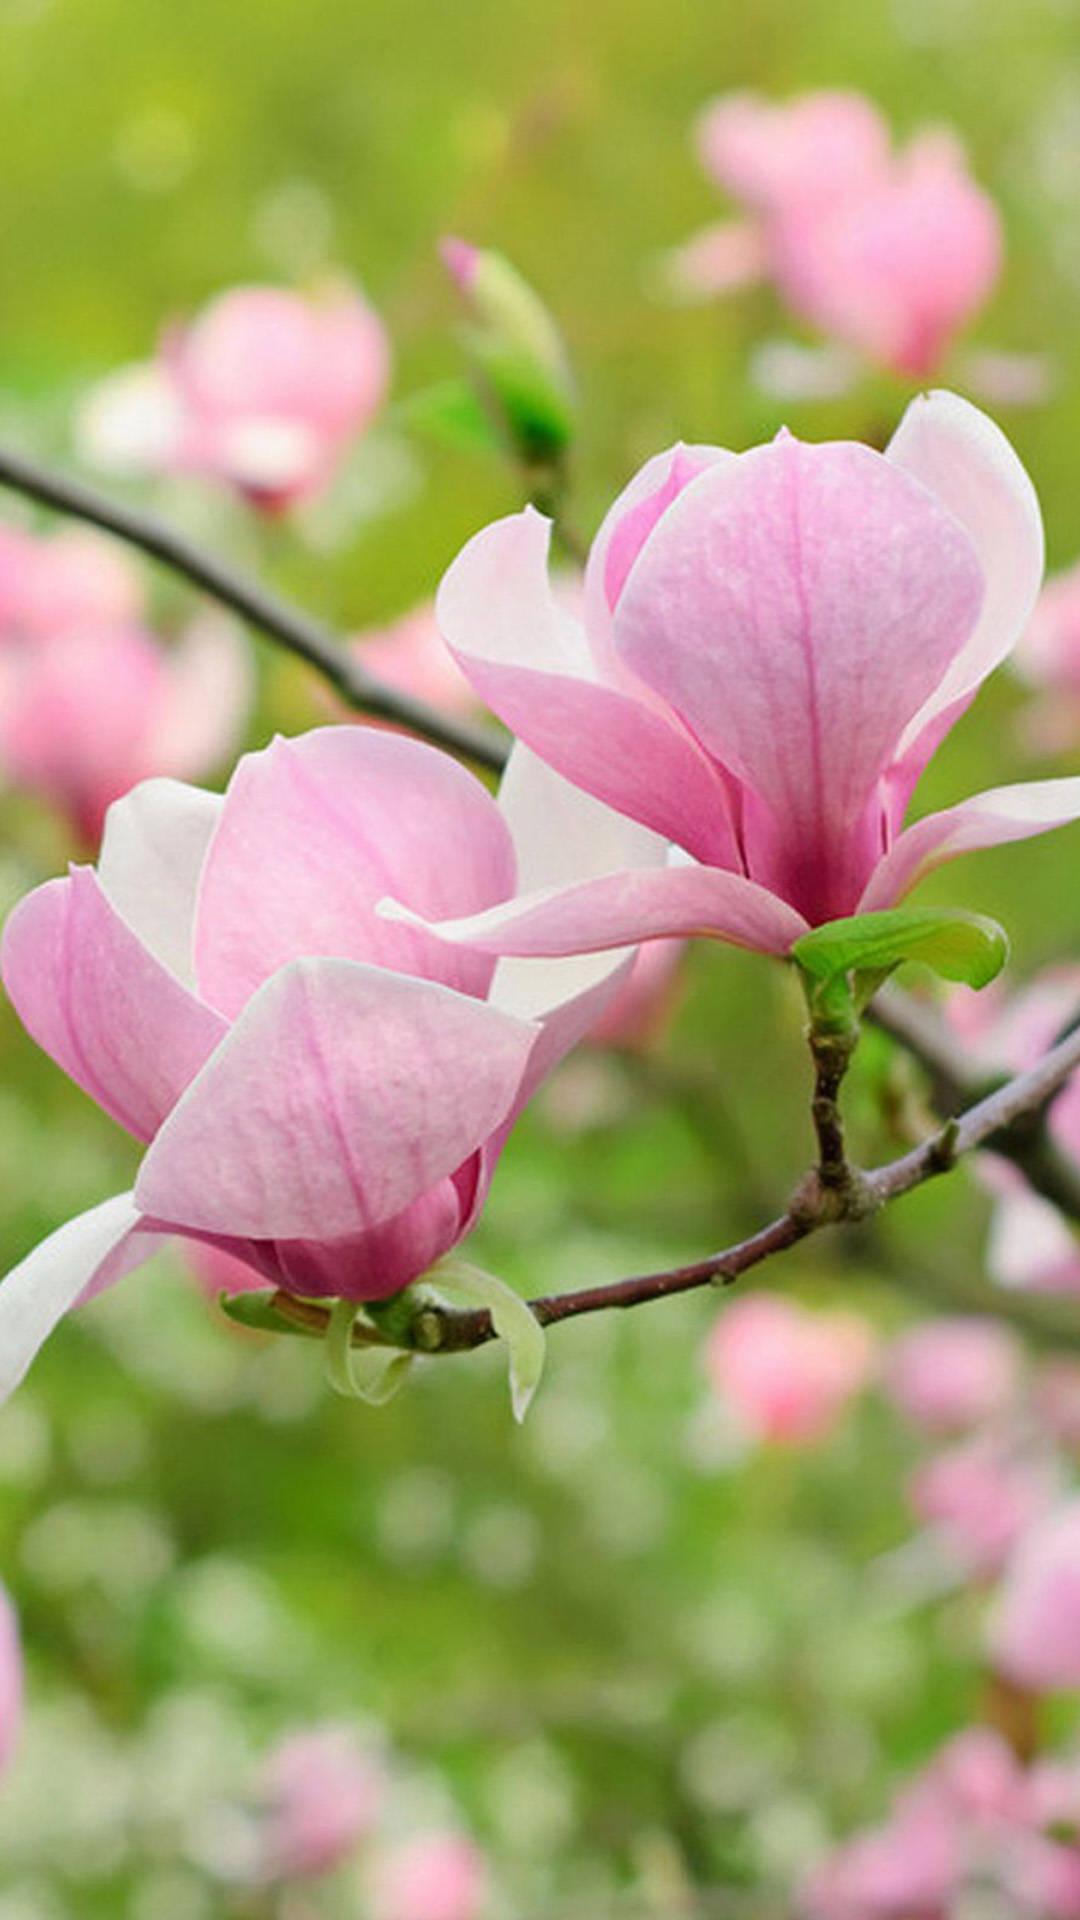 Pink magnolia htc one wallpaper